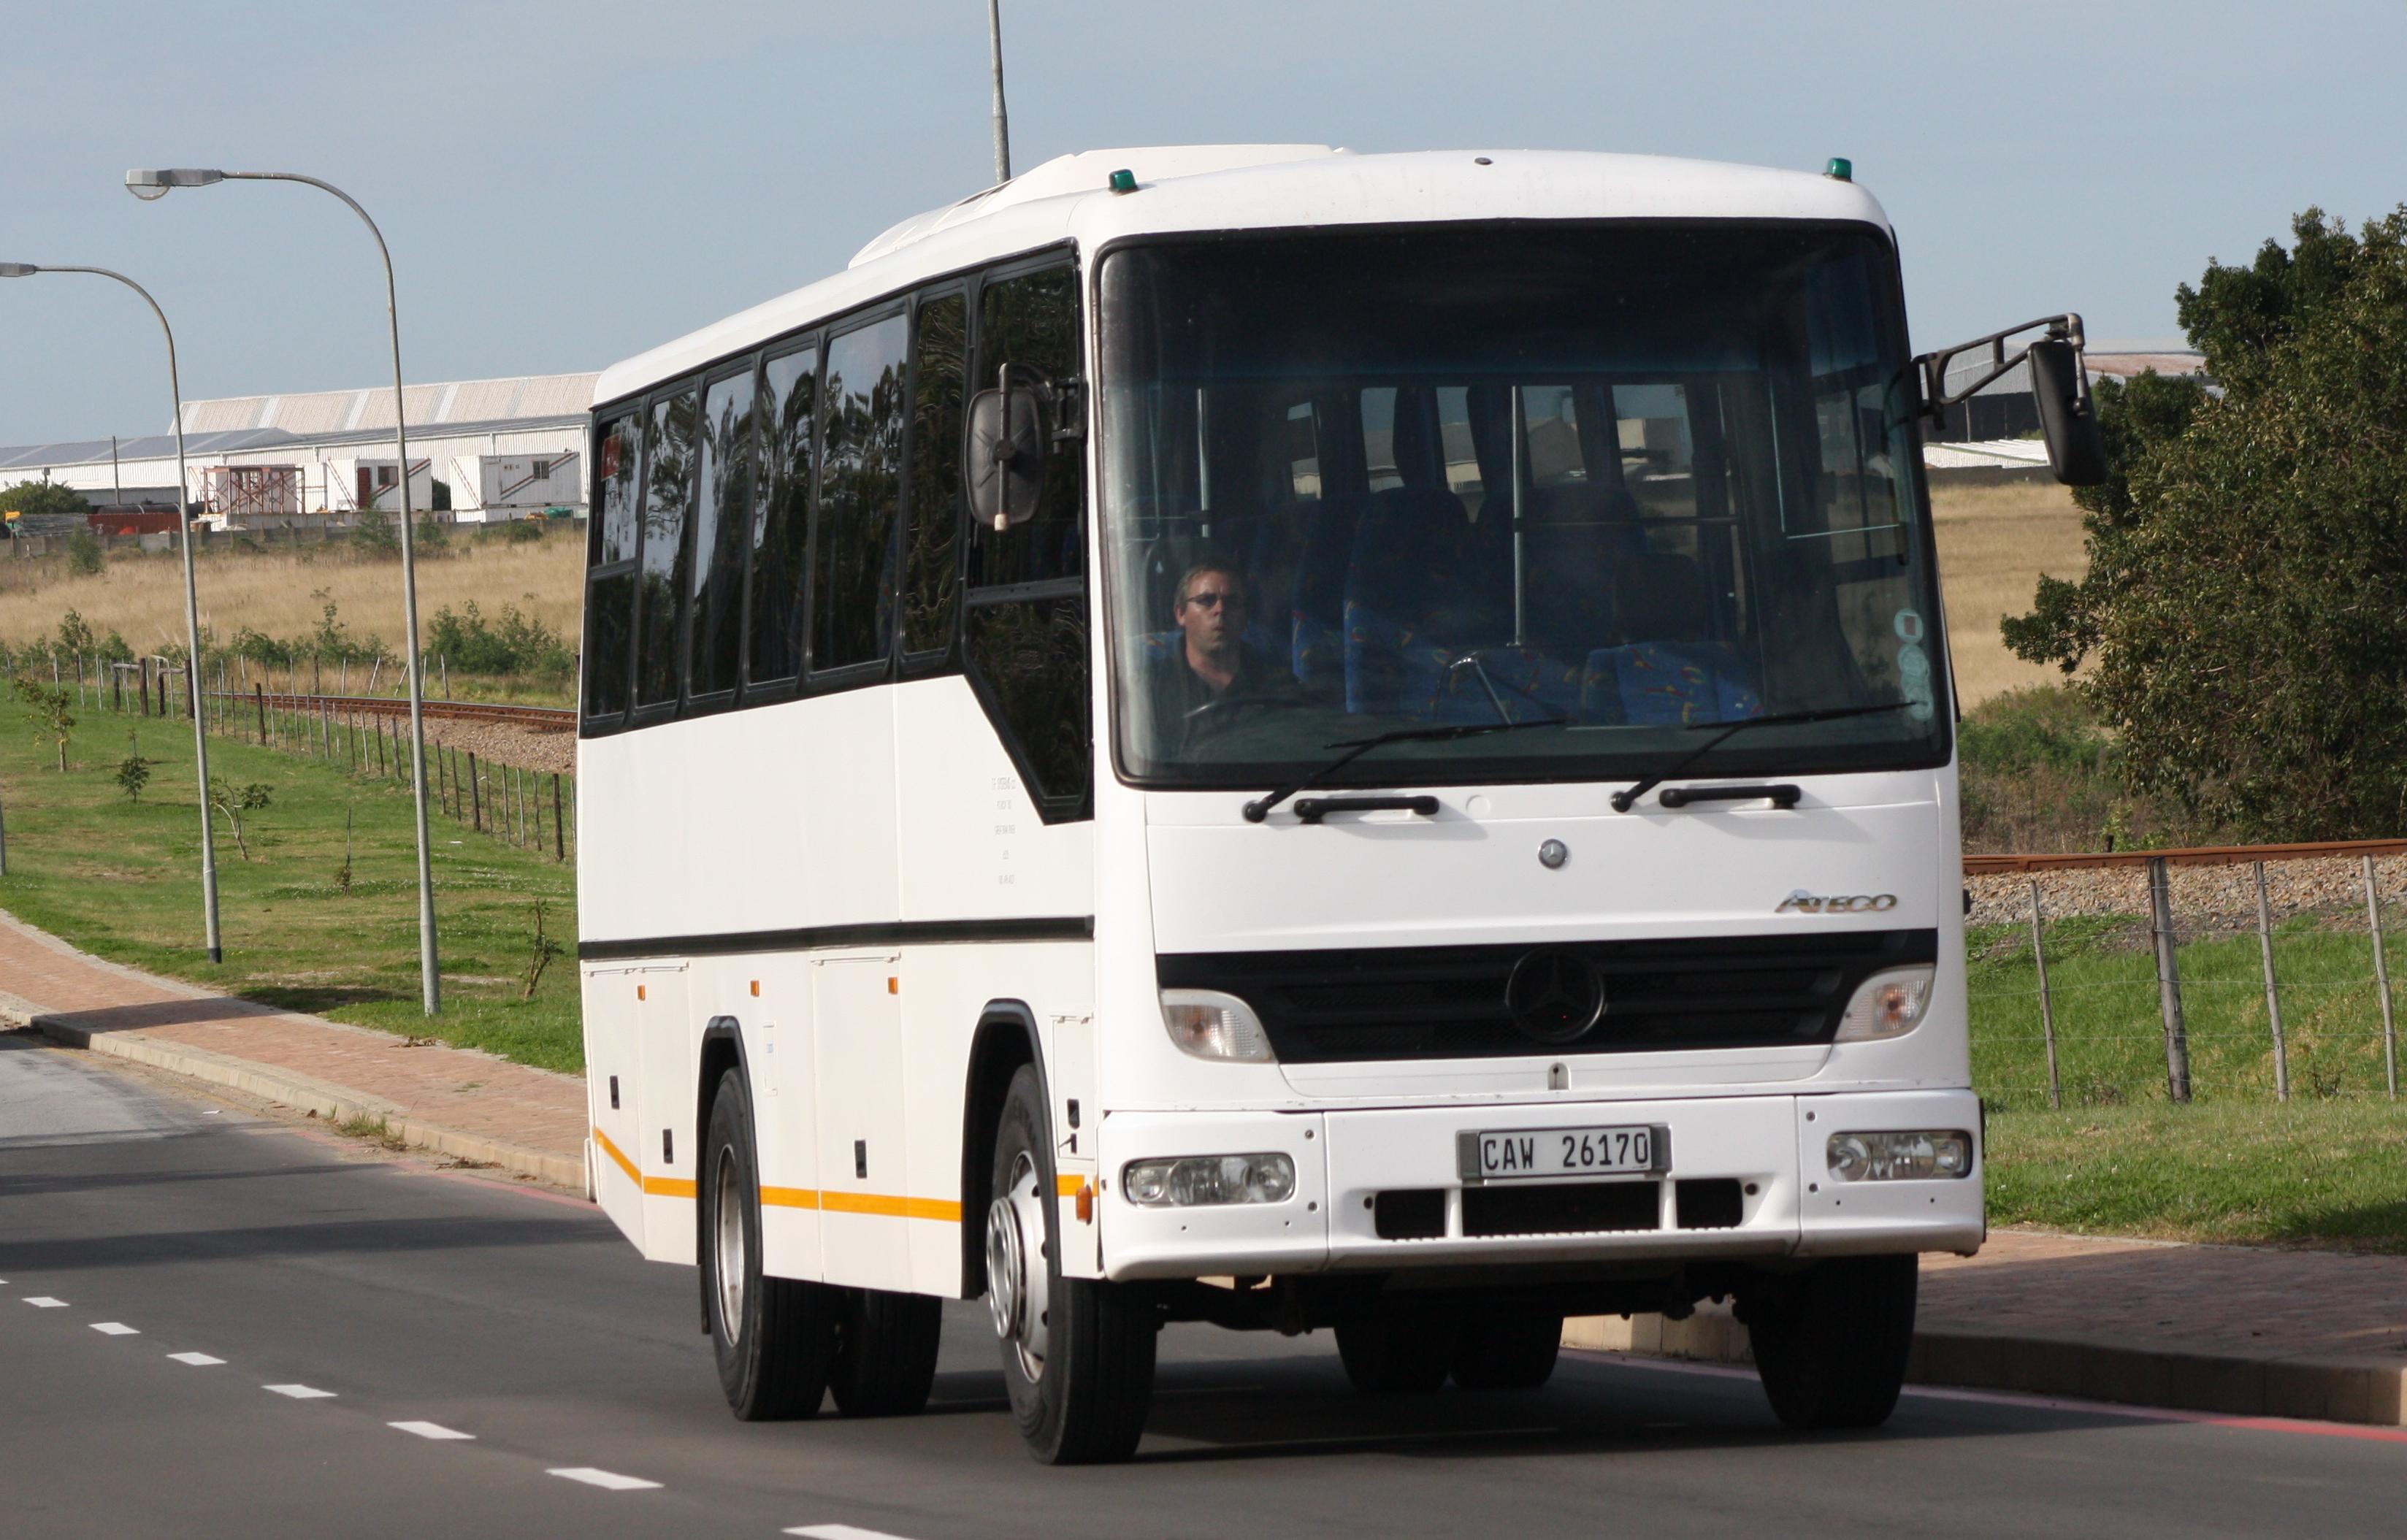 Mercedes atego bus images for Mercedes benz busses